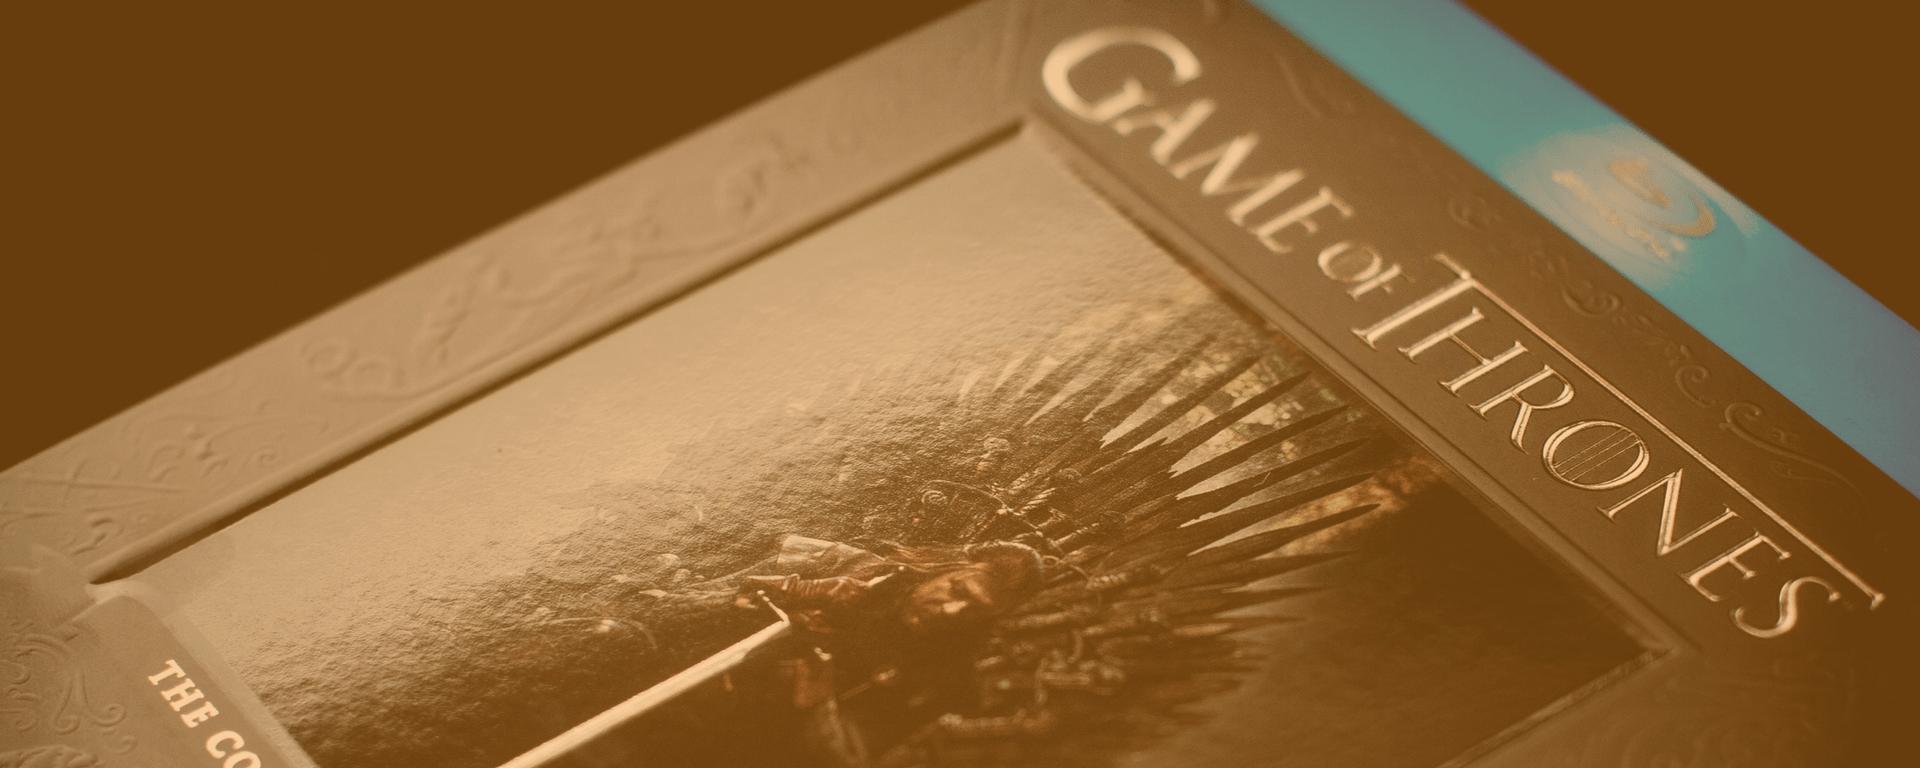 Marketing game of thrones